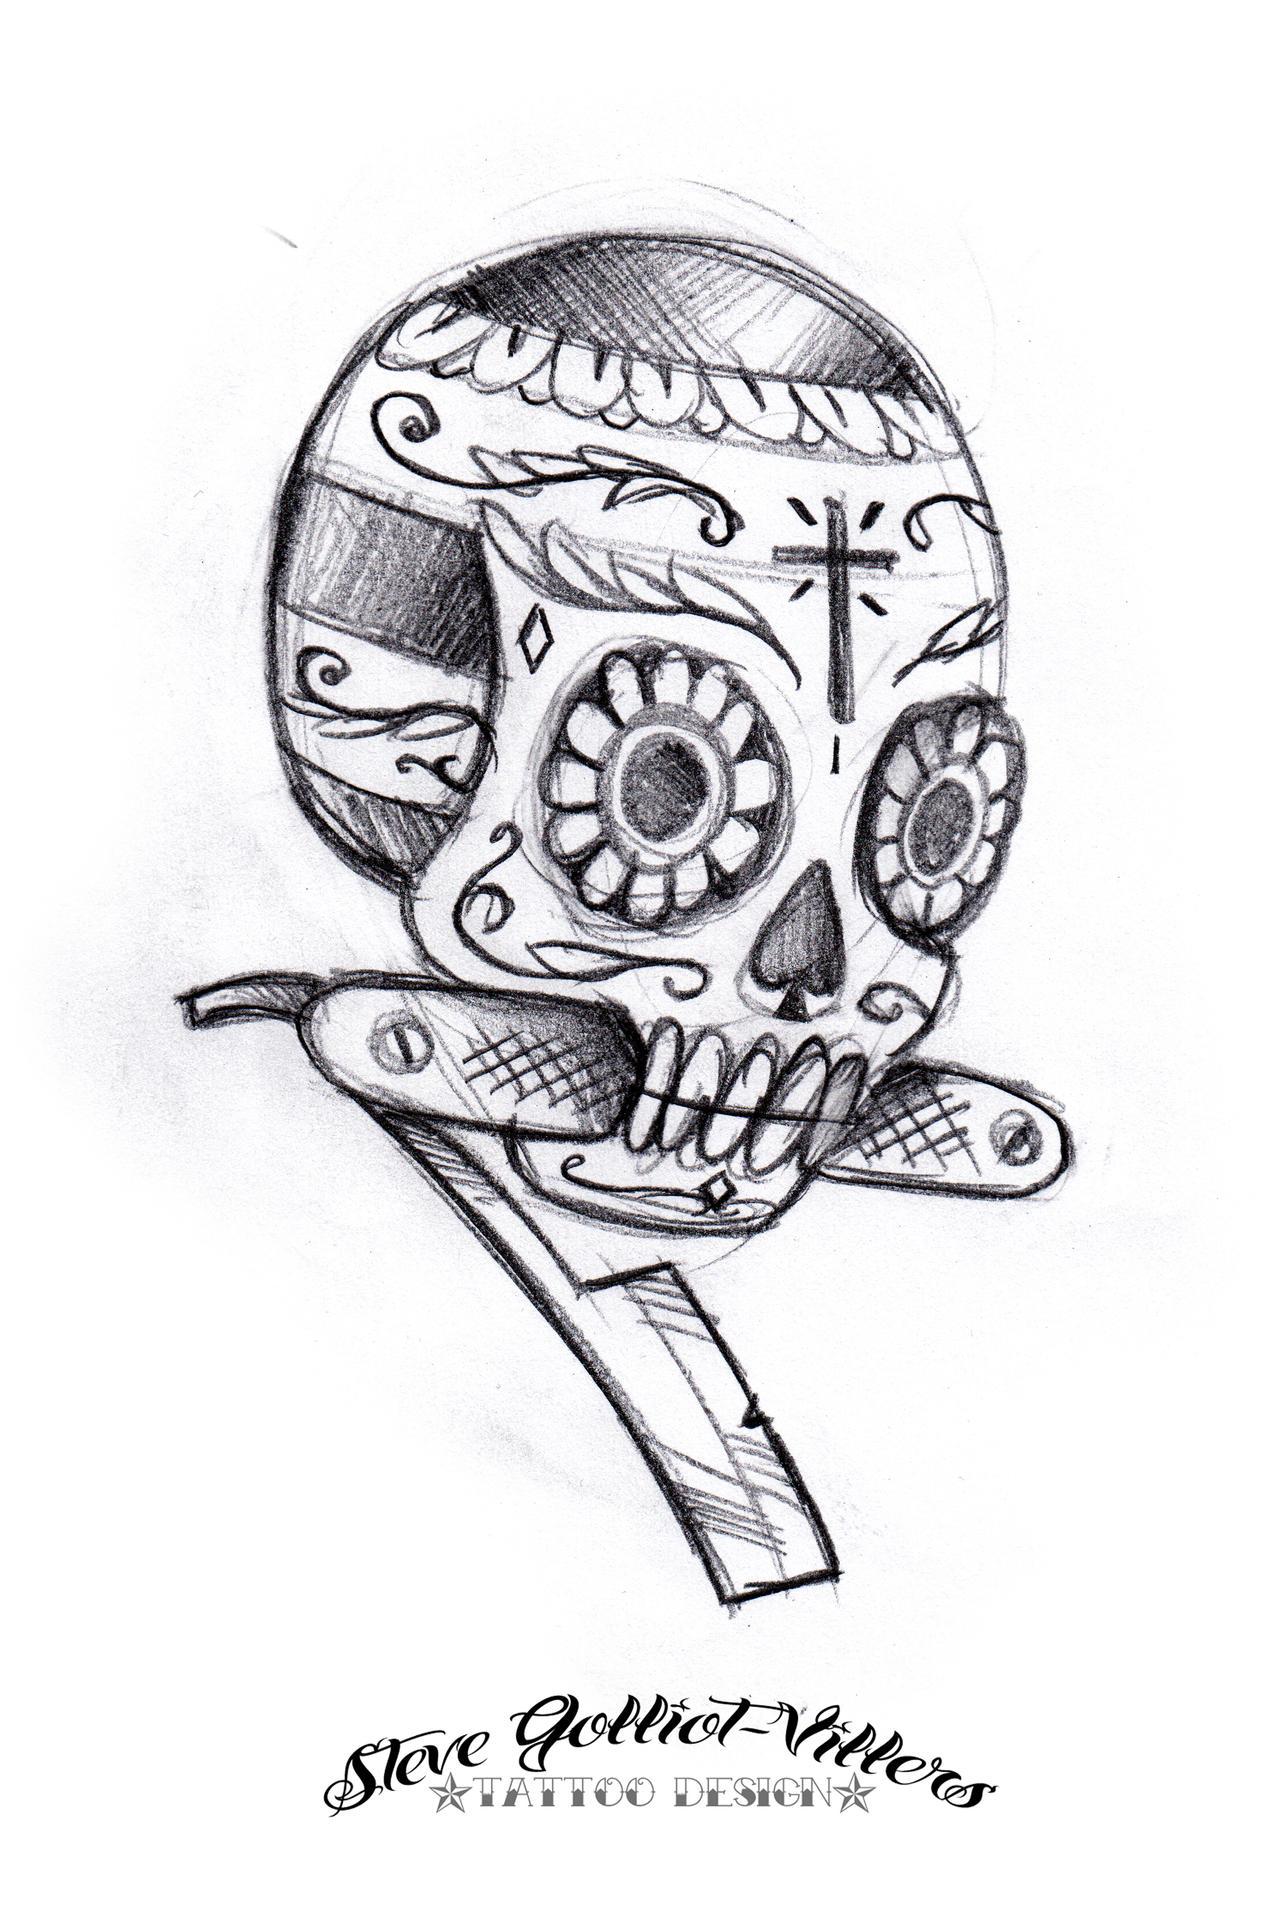 skull razor by stevegolliotvillers on deviantart. Black Bedroom Furniture Sets. Home Design Ideas